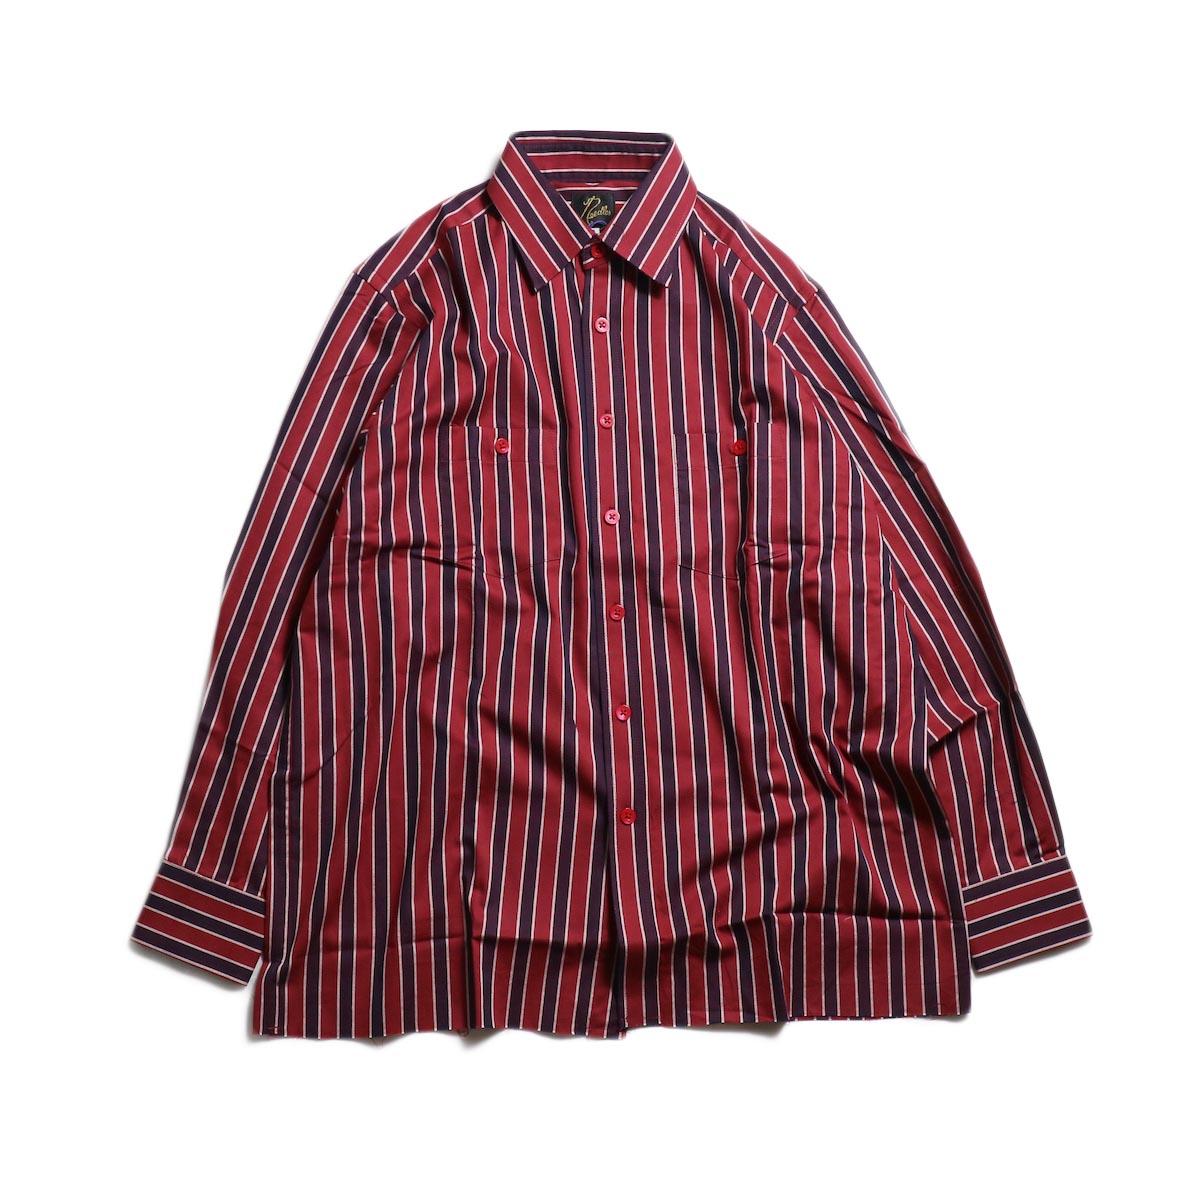 Needles / Cut-Off Bottom Regular Collar Shirt -Cotton Twill Stripe (Red) 正面